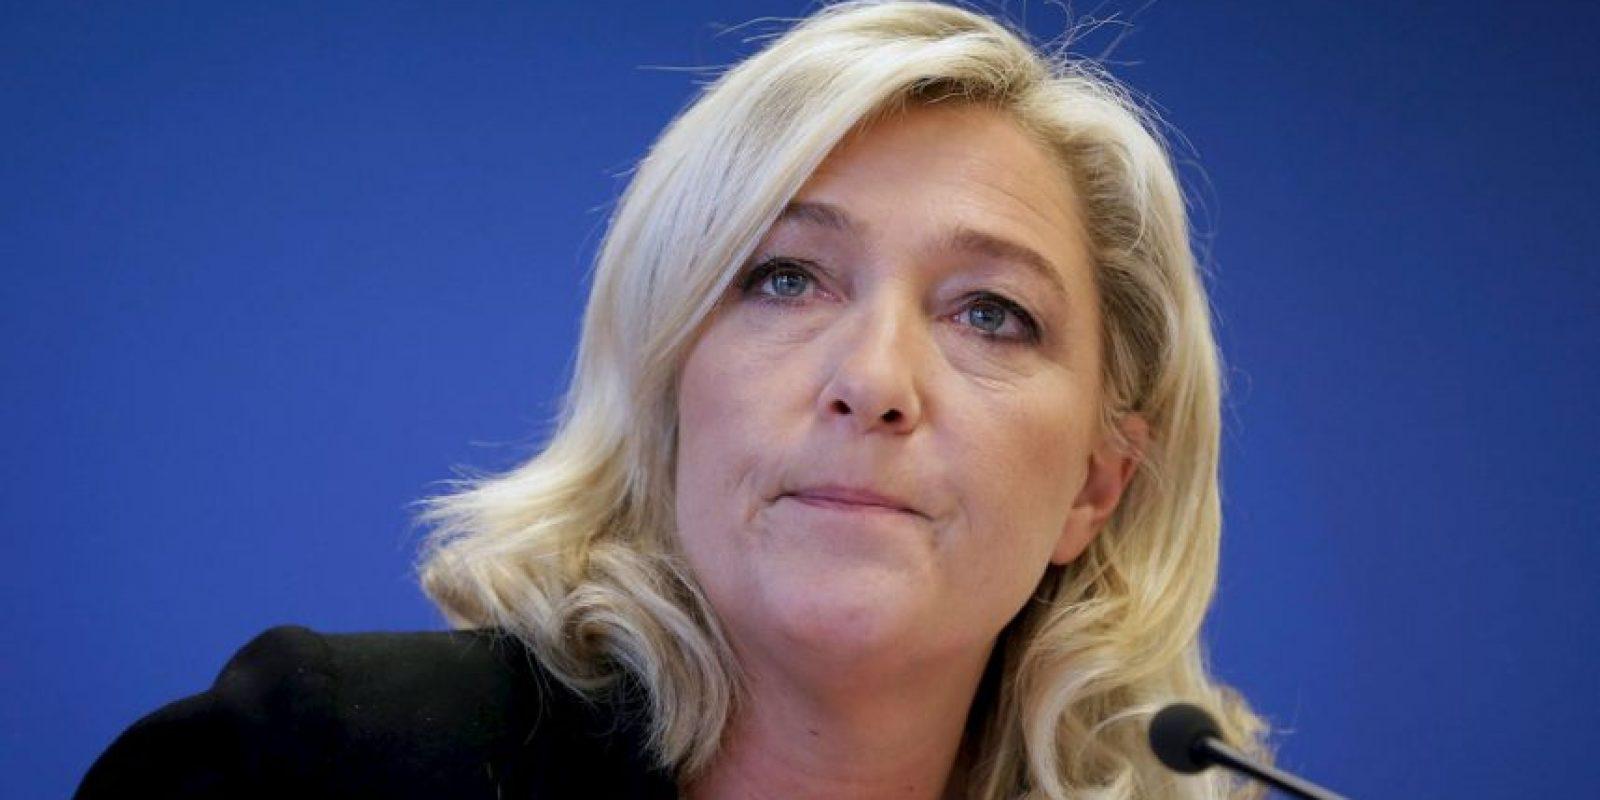 Es hija del anterior presidente del Frente Nacional, Jean-Marie Le Pen. Foto:Wikicommons